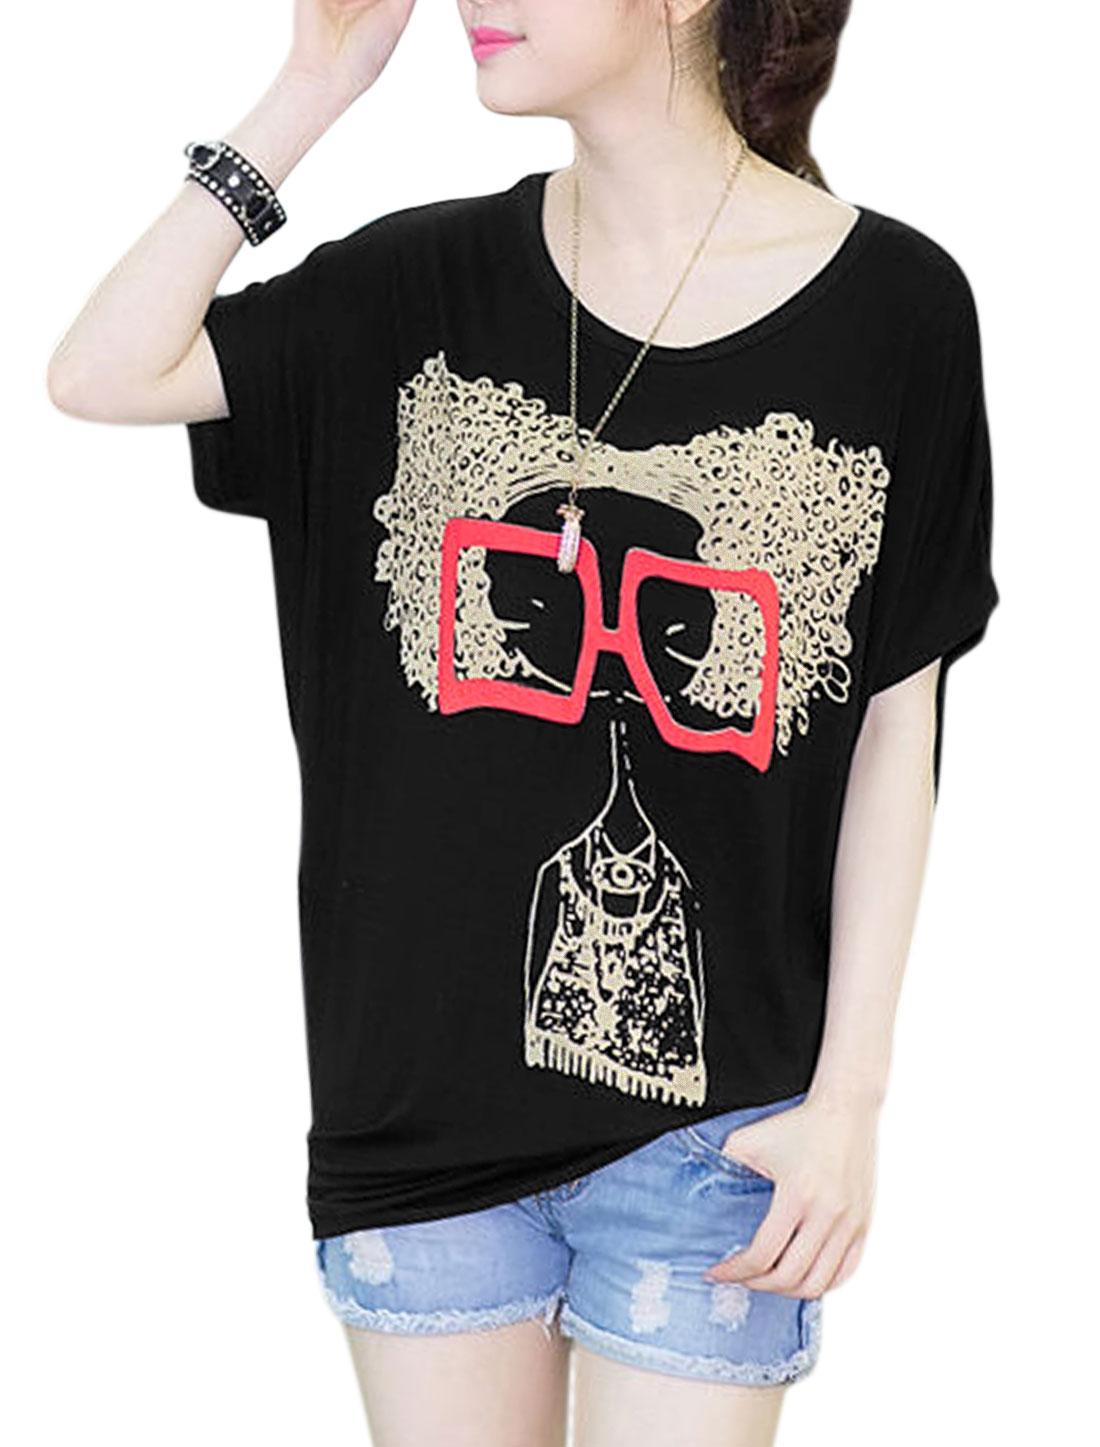 Woman's Short Dolman Sleeve Round Neck Portrait Print T-Shirt Black XS